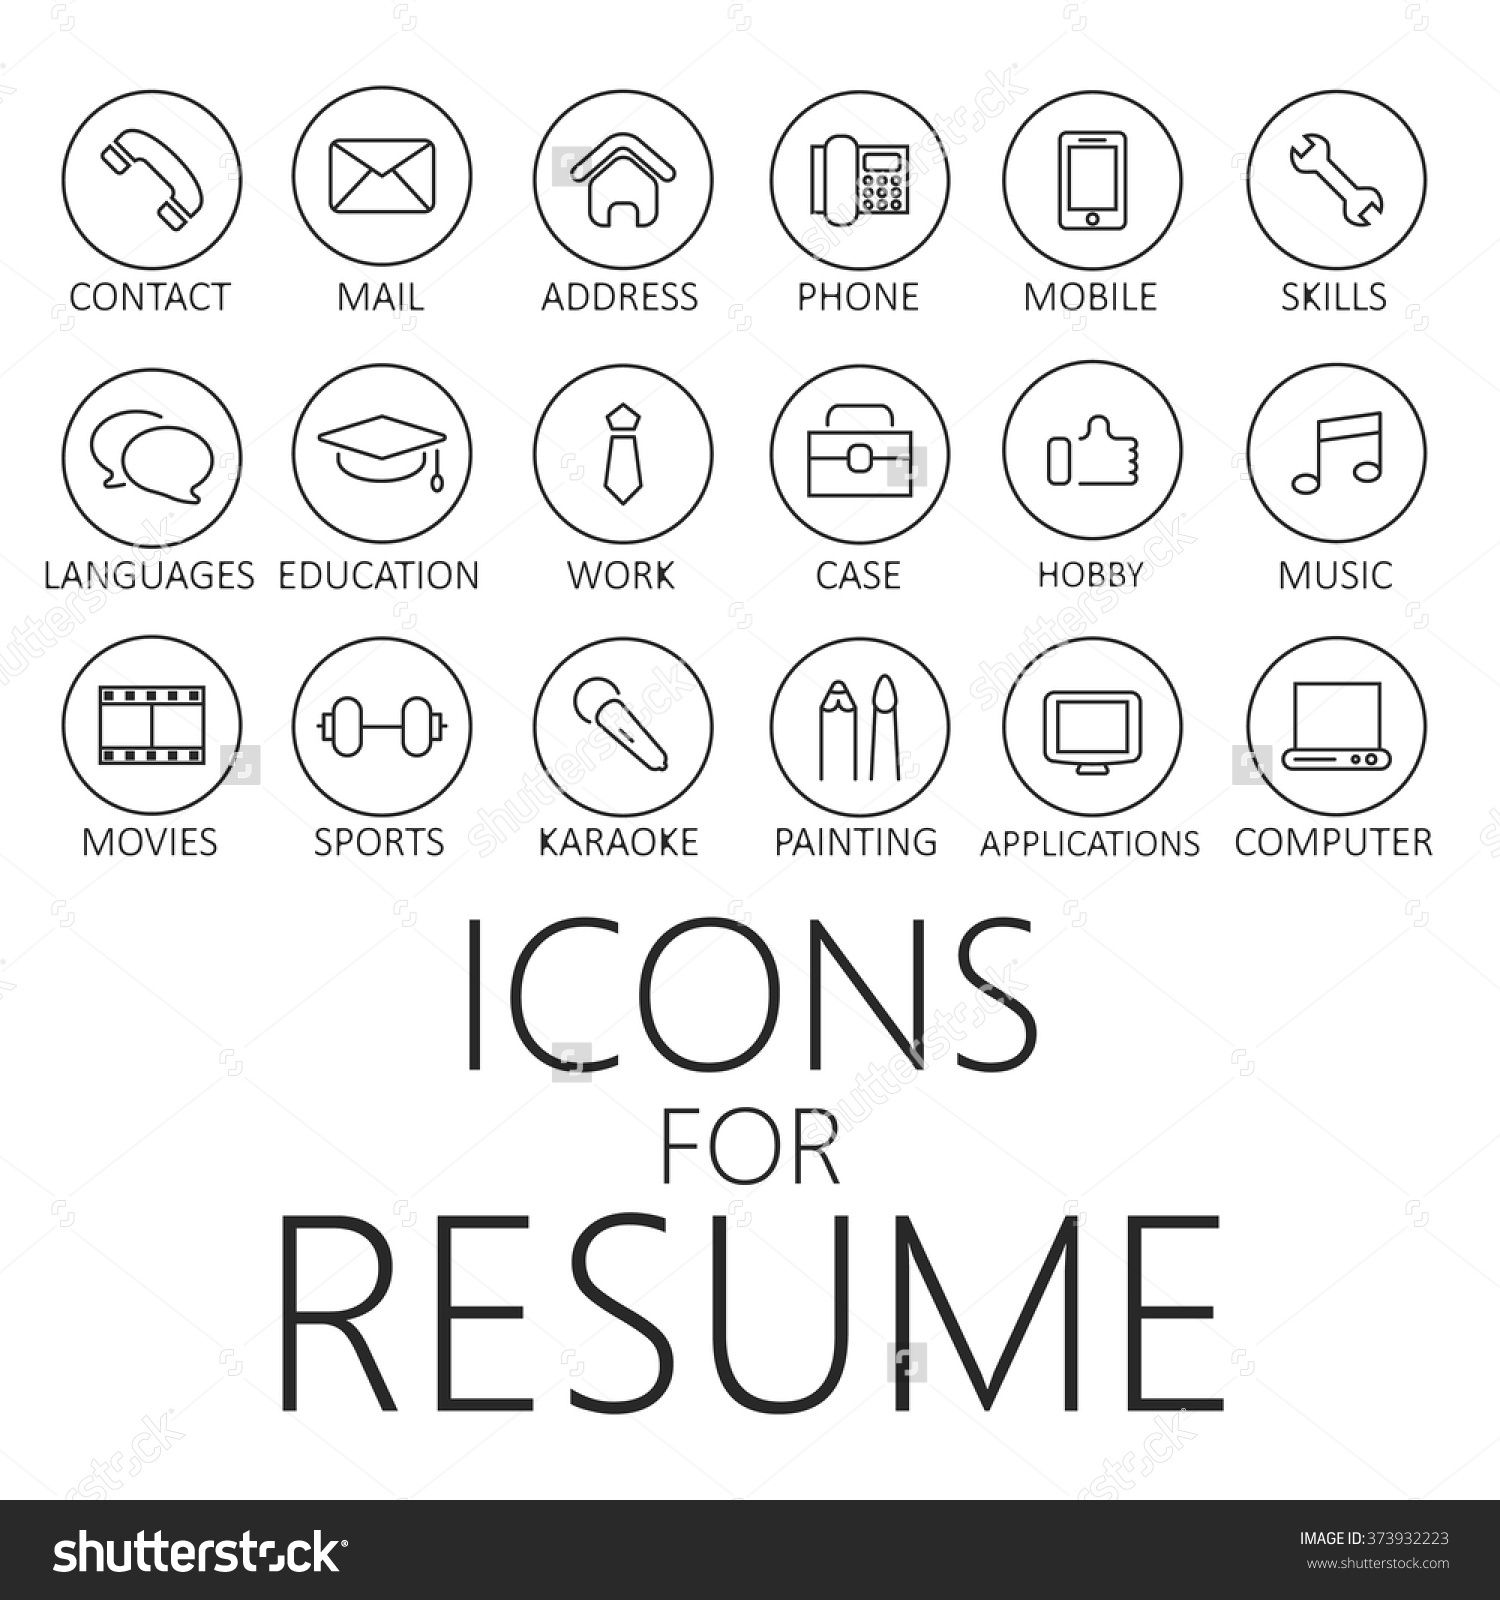 Resume Icons Free